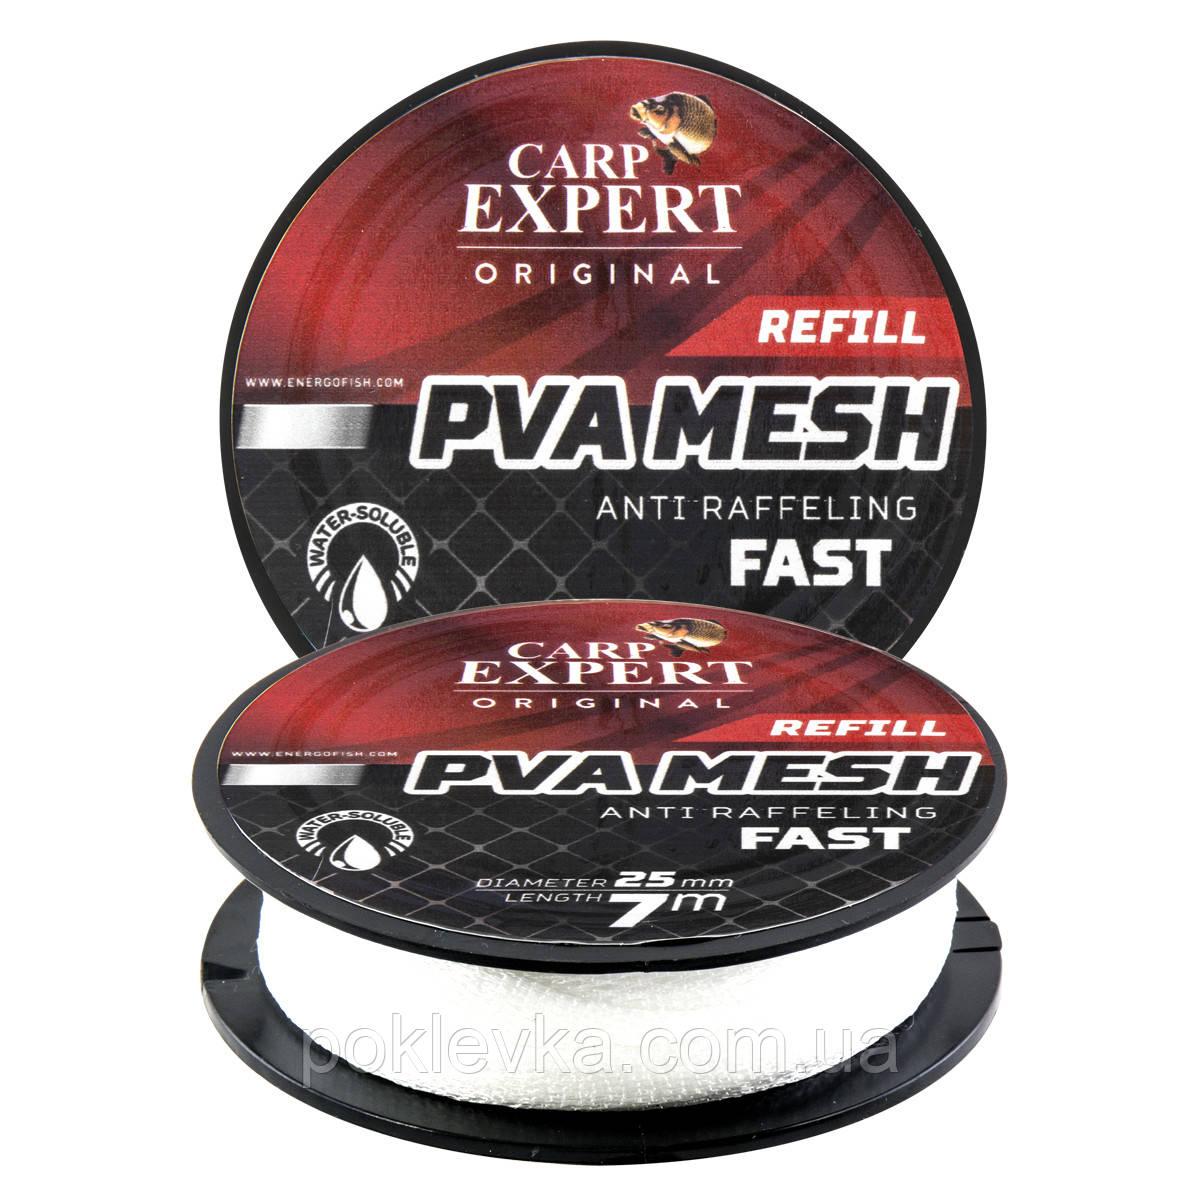 ПВА-сетка 7м 35мм на шпуле Energofish Carp Expert PVA Refill Mesh Anti Raffeling Fast (30141535)